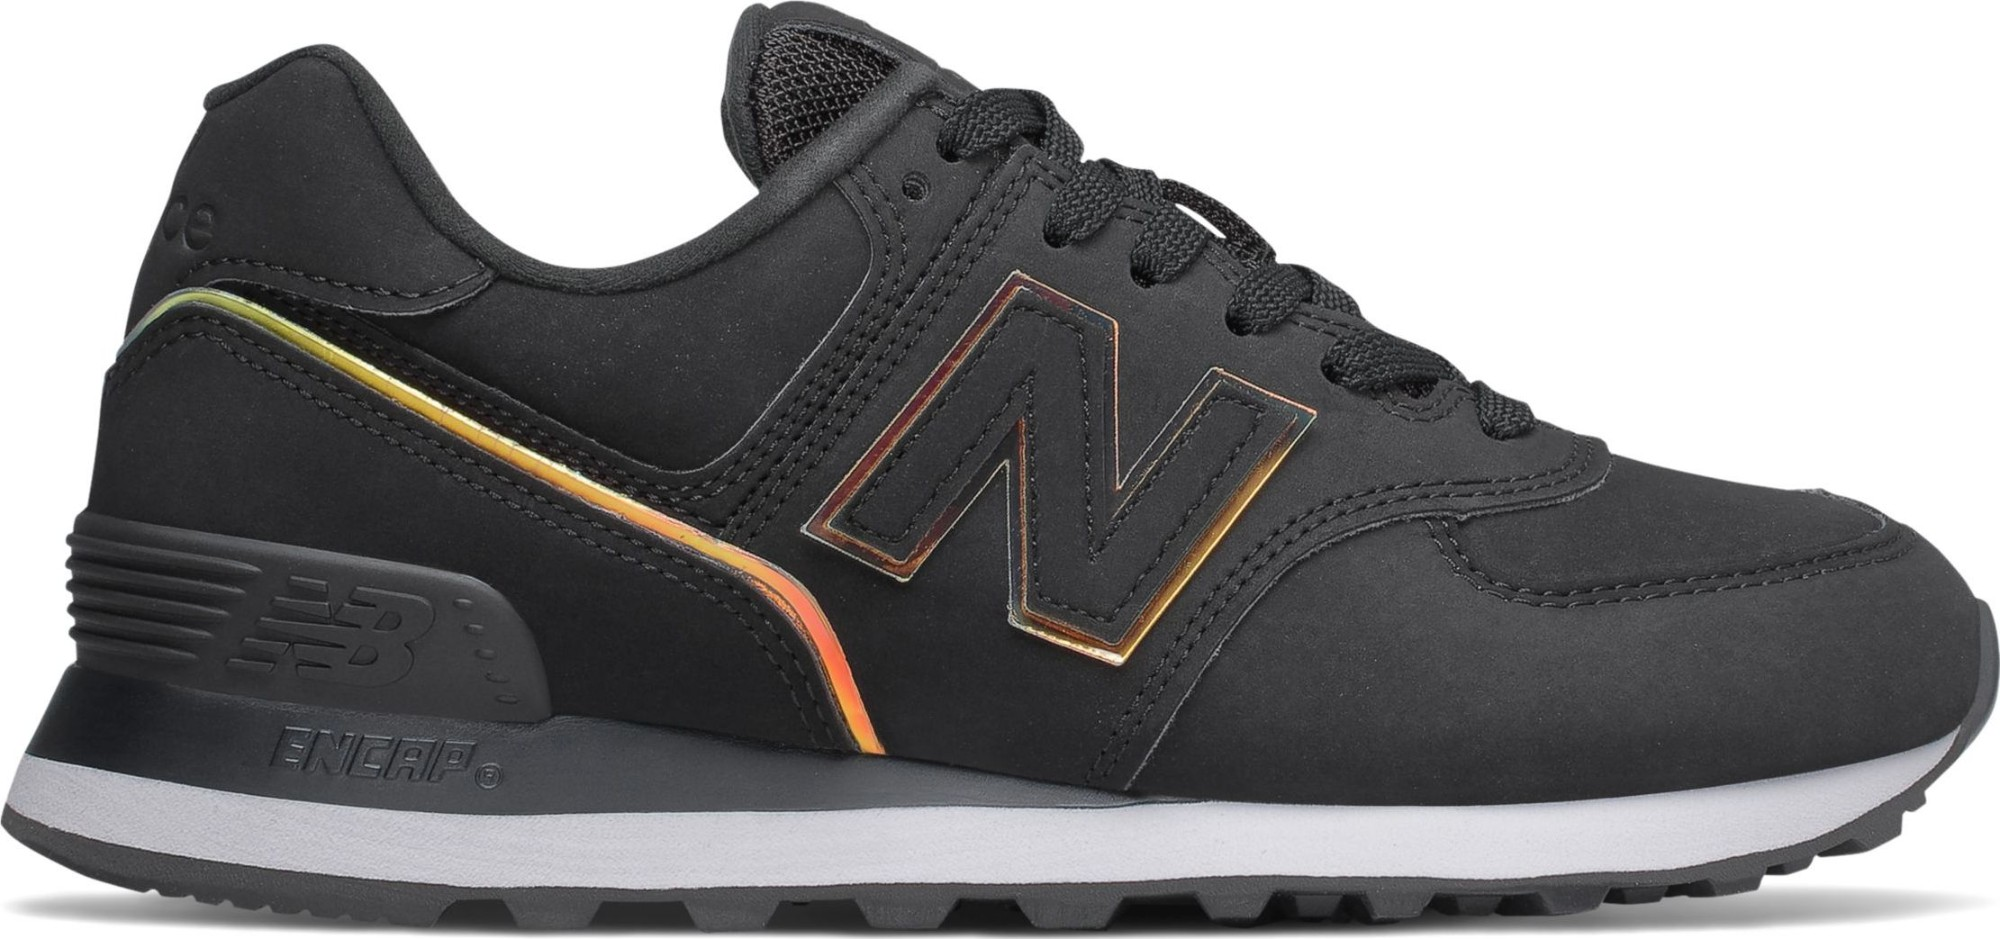 New Balance WL574 Nubuck Black CLG 40,5